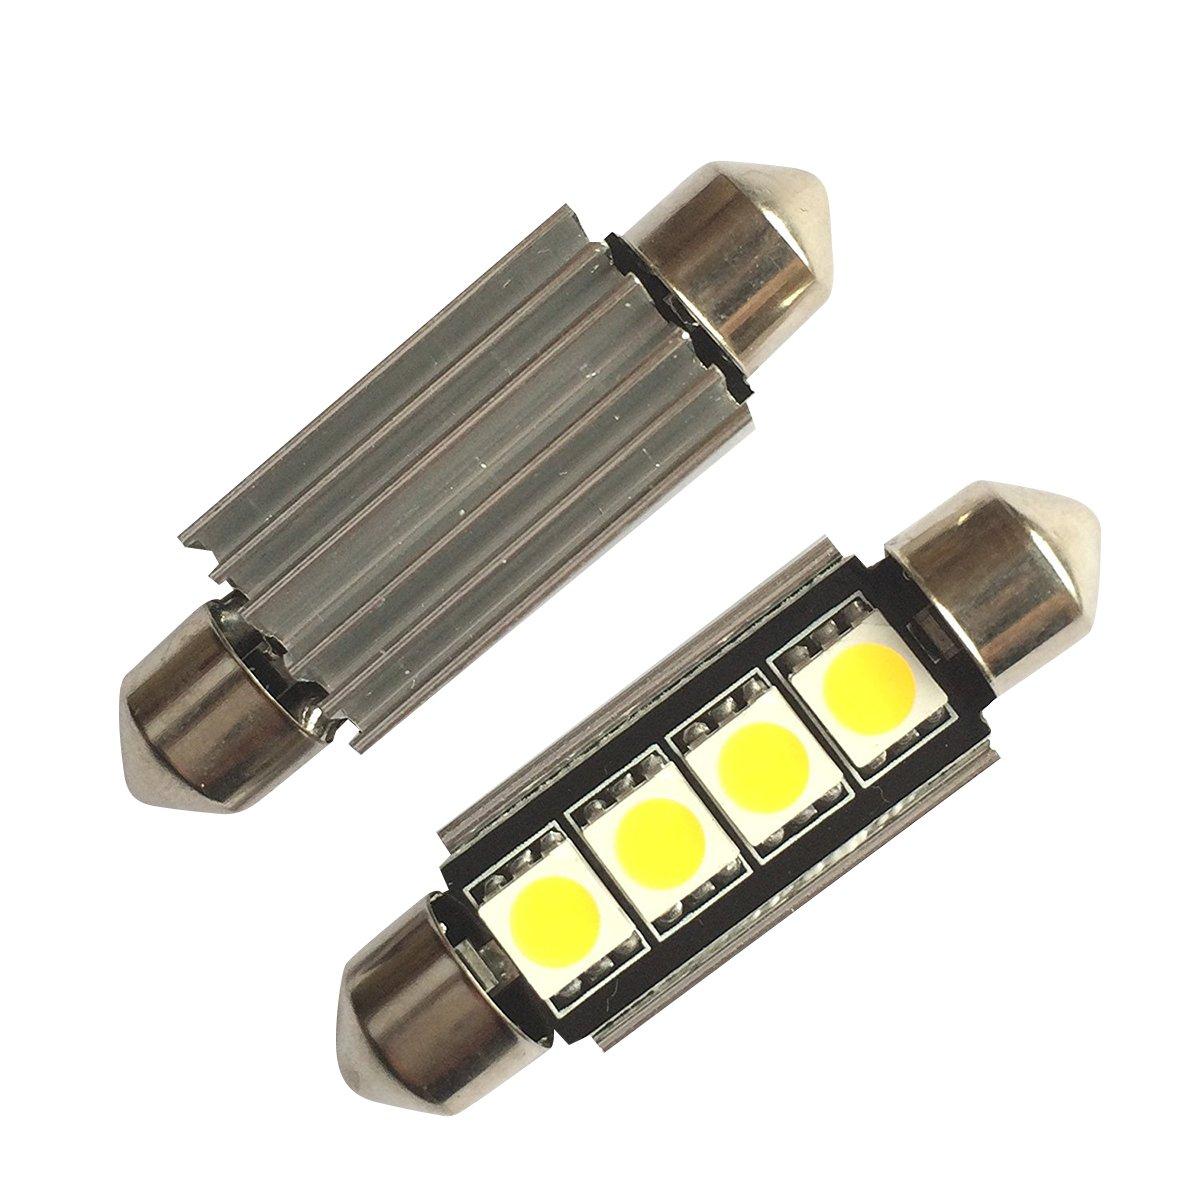 LIGHTEU®, 2xLED-Soffitte für 42mm Lampensockel mit 4 SMD LEDs Leuchtfarbe warm weiß [Energieklasse A++]